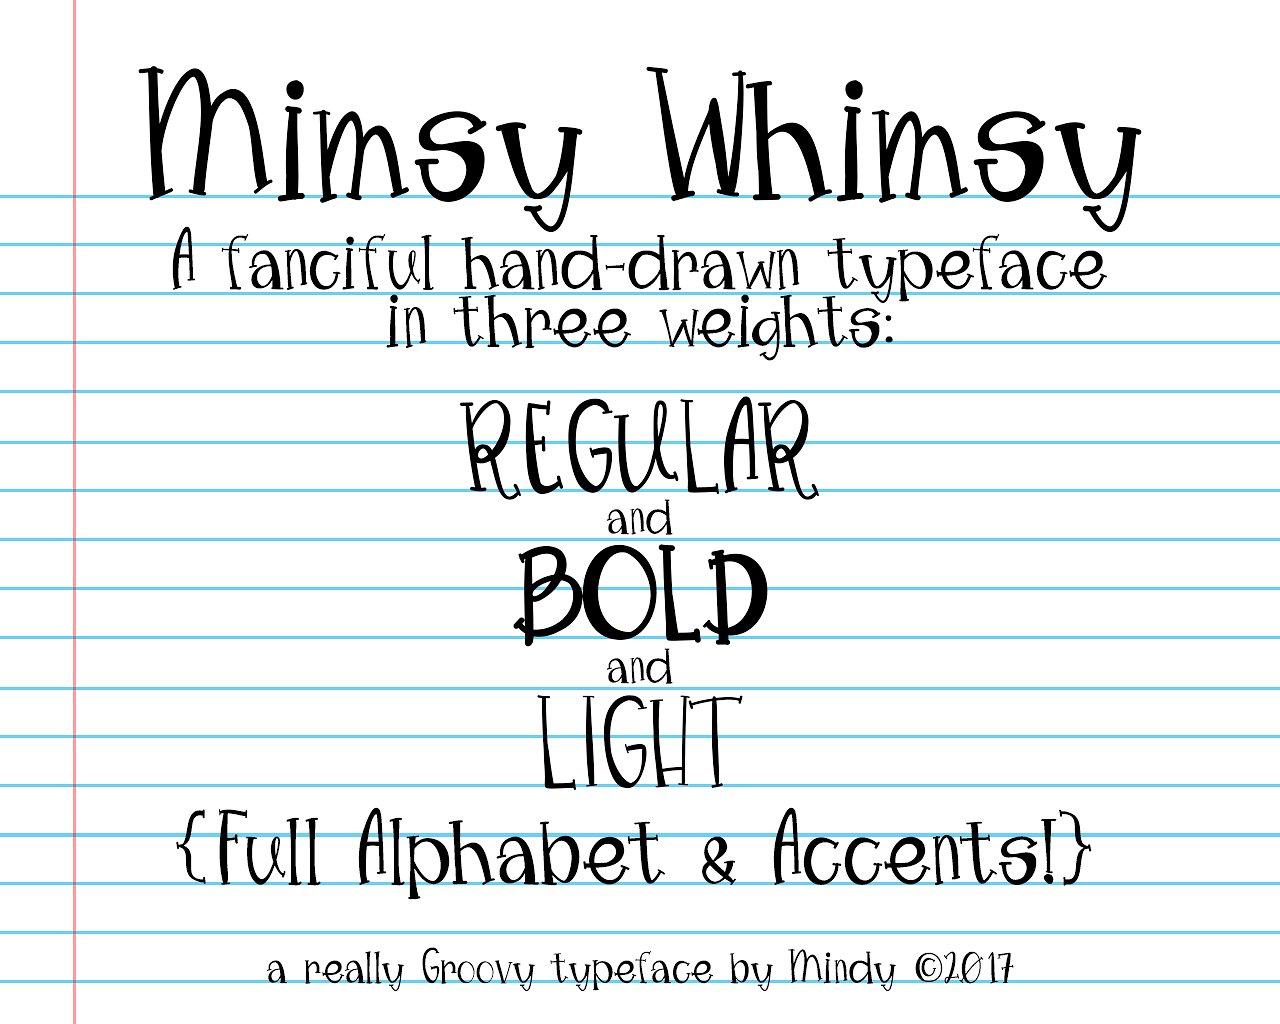 mimsy-whimsy-typeface